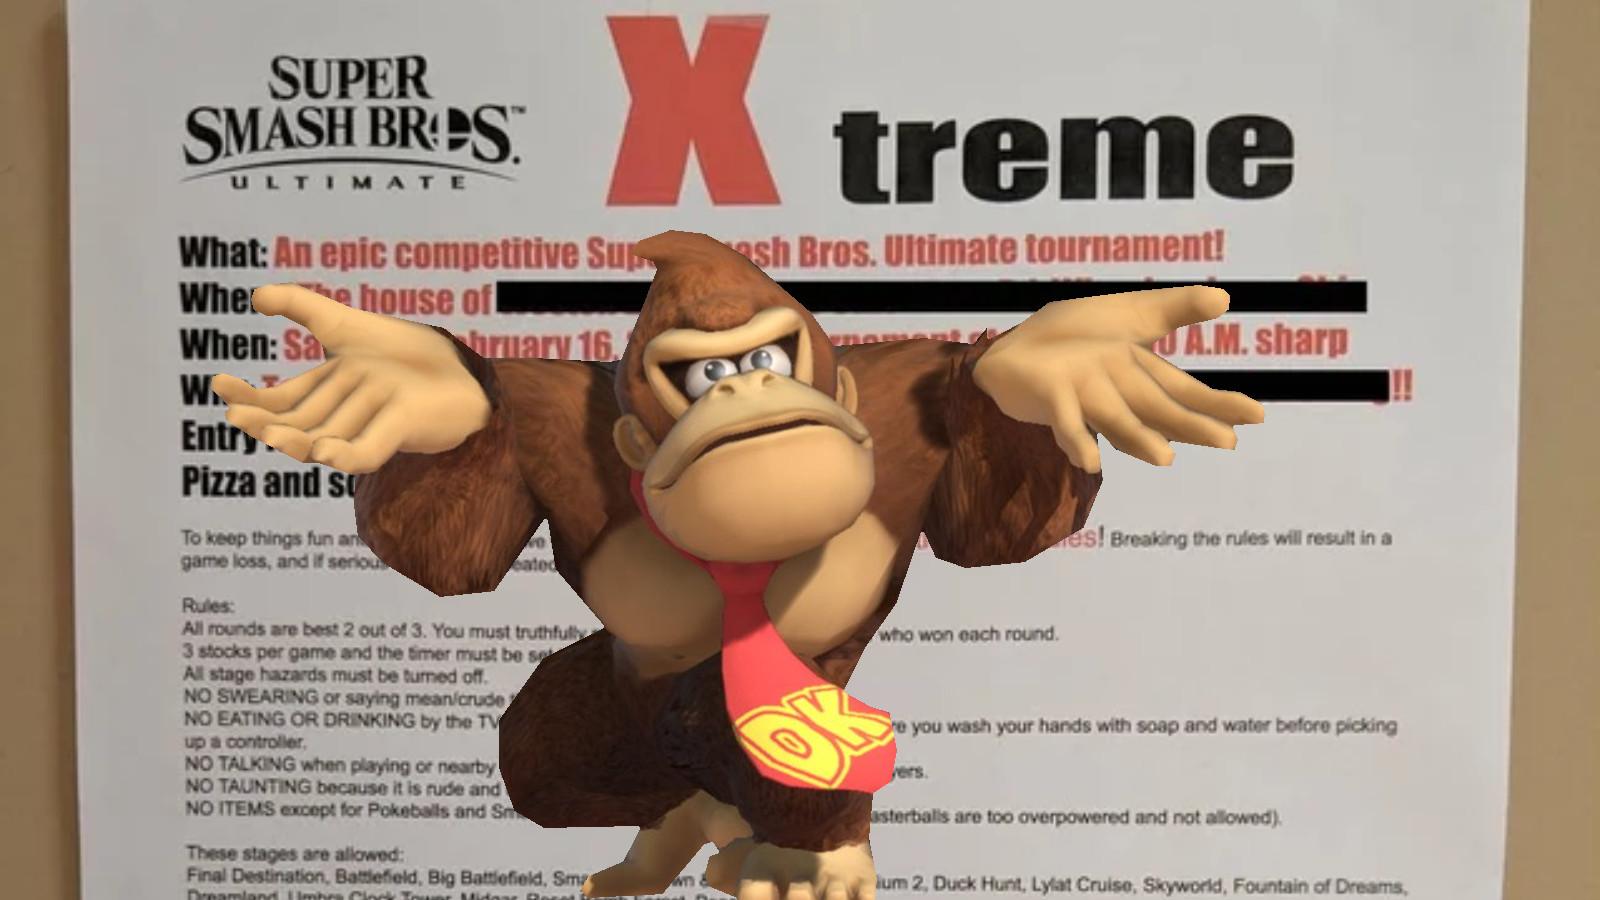 Viral Smash Ultimate xtreme ruleset tournament